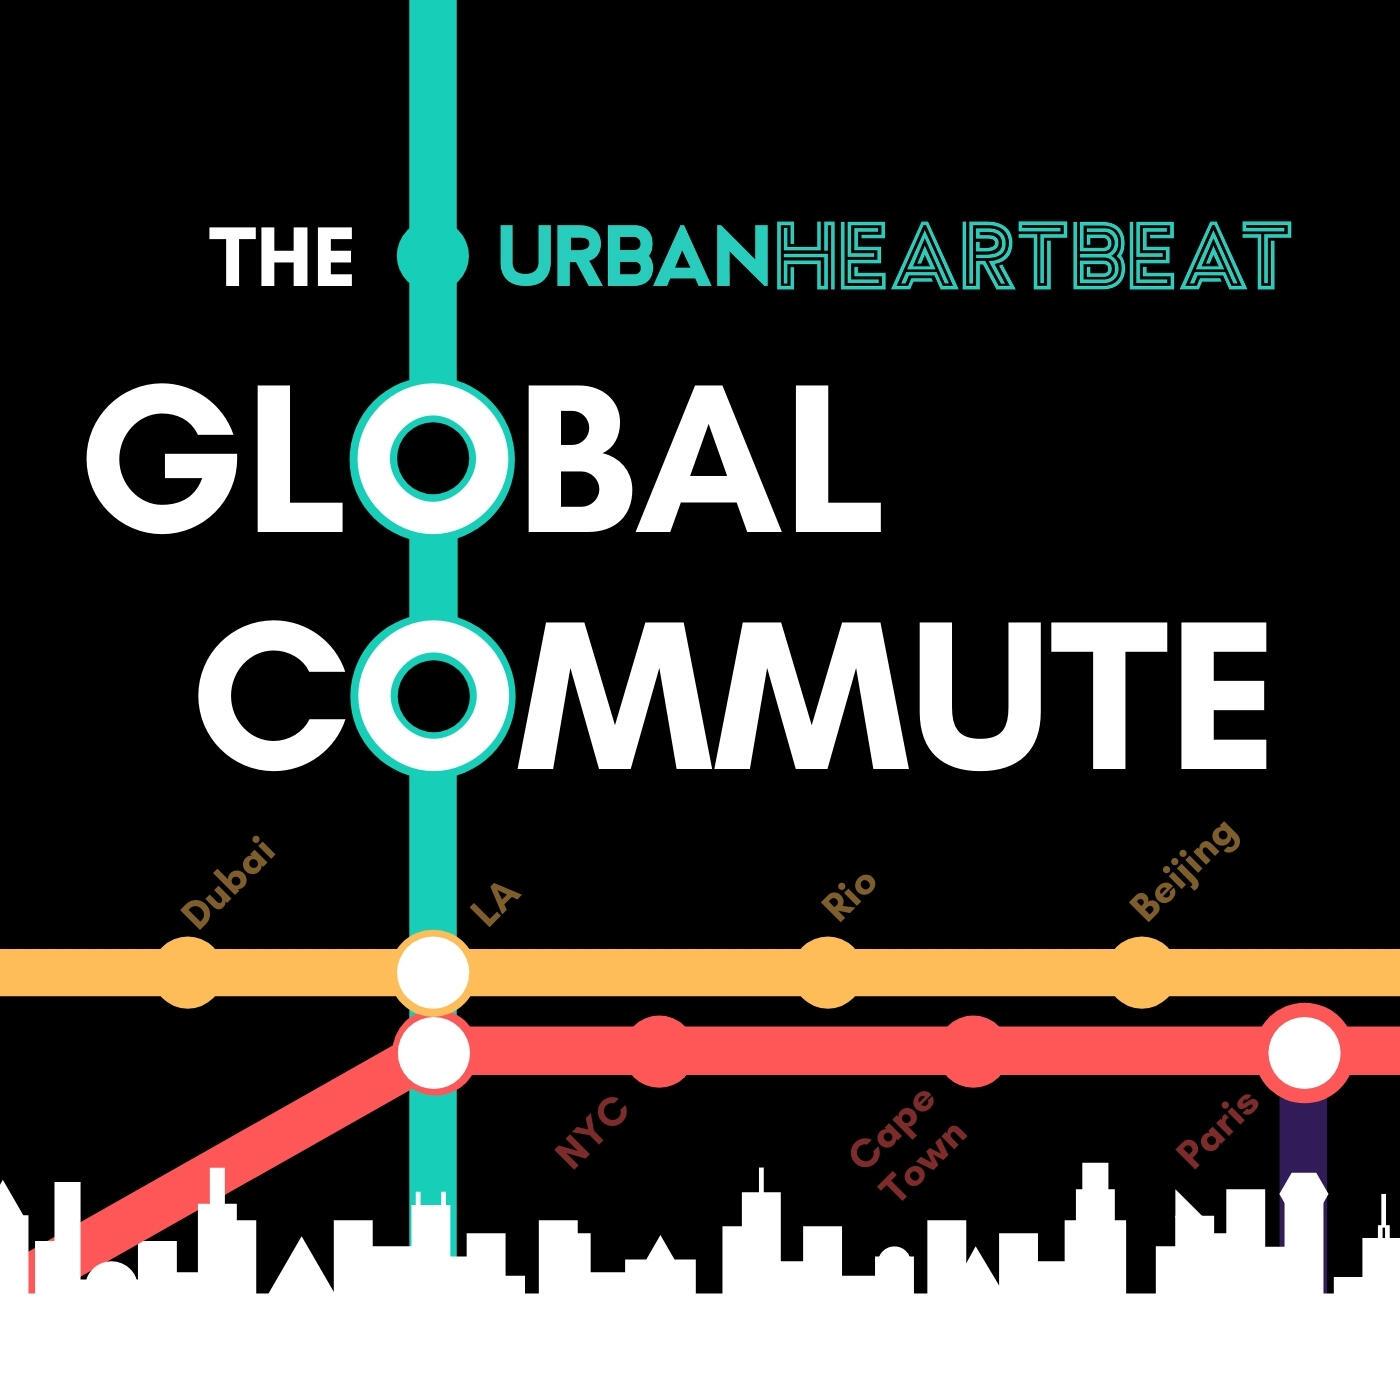 The Urban Heartbeat Global Commute